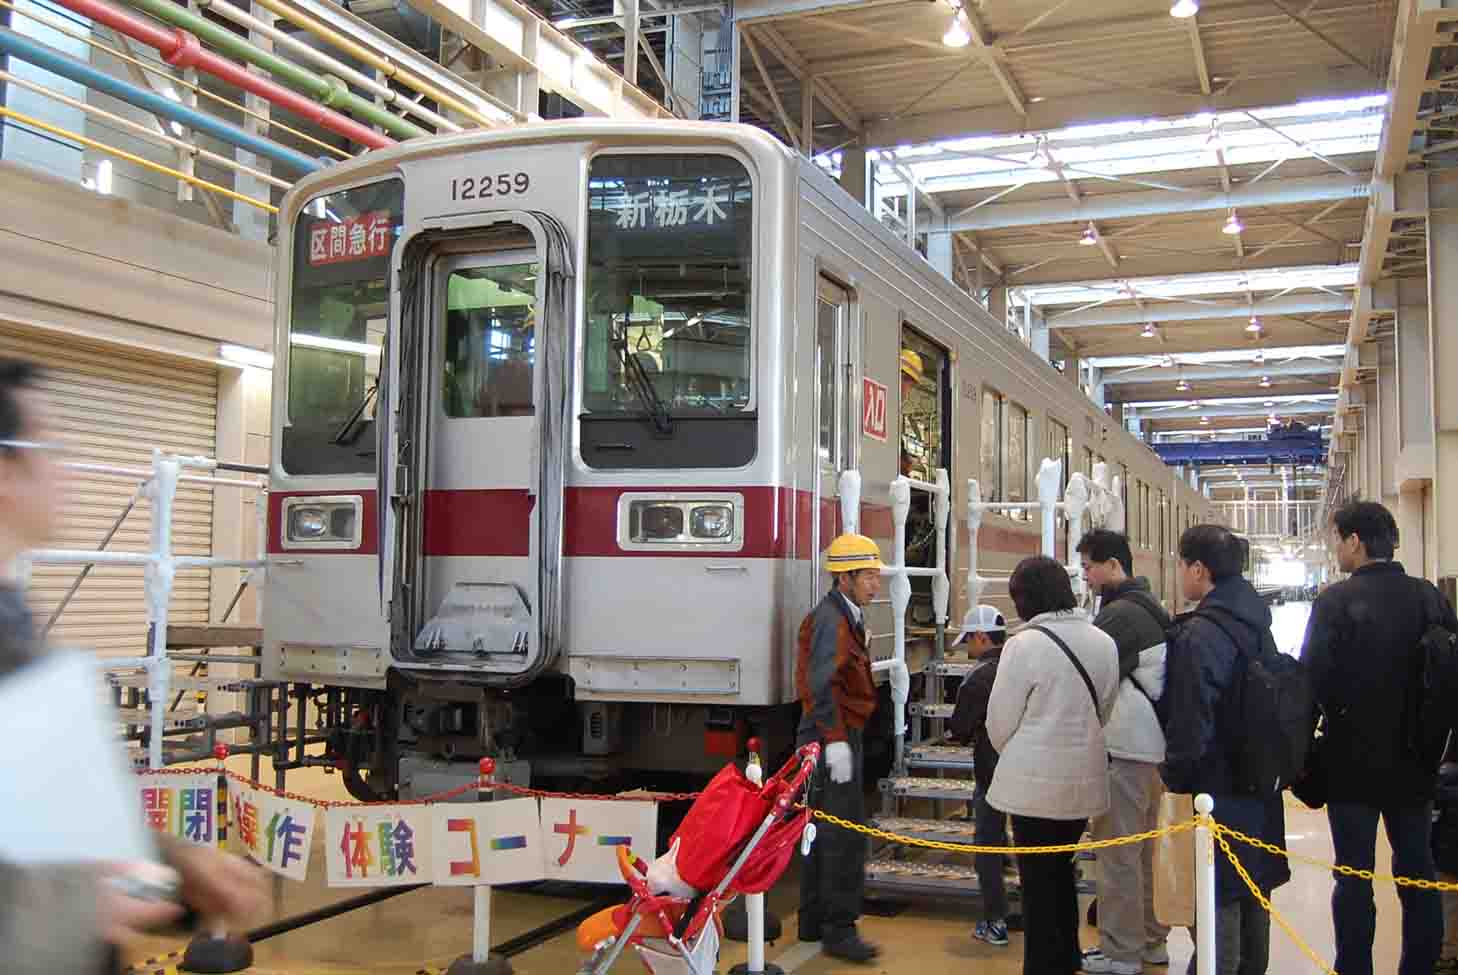 20101205南栗橋東武フェス 057A